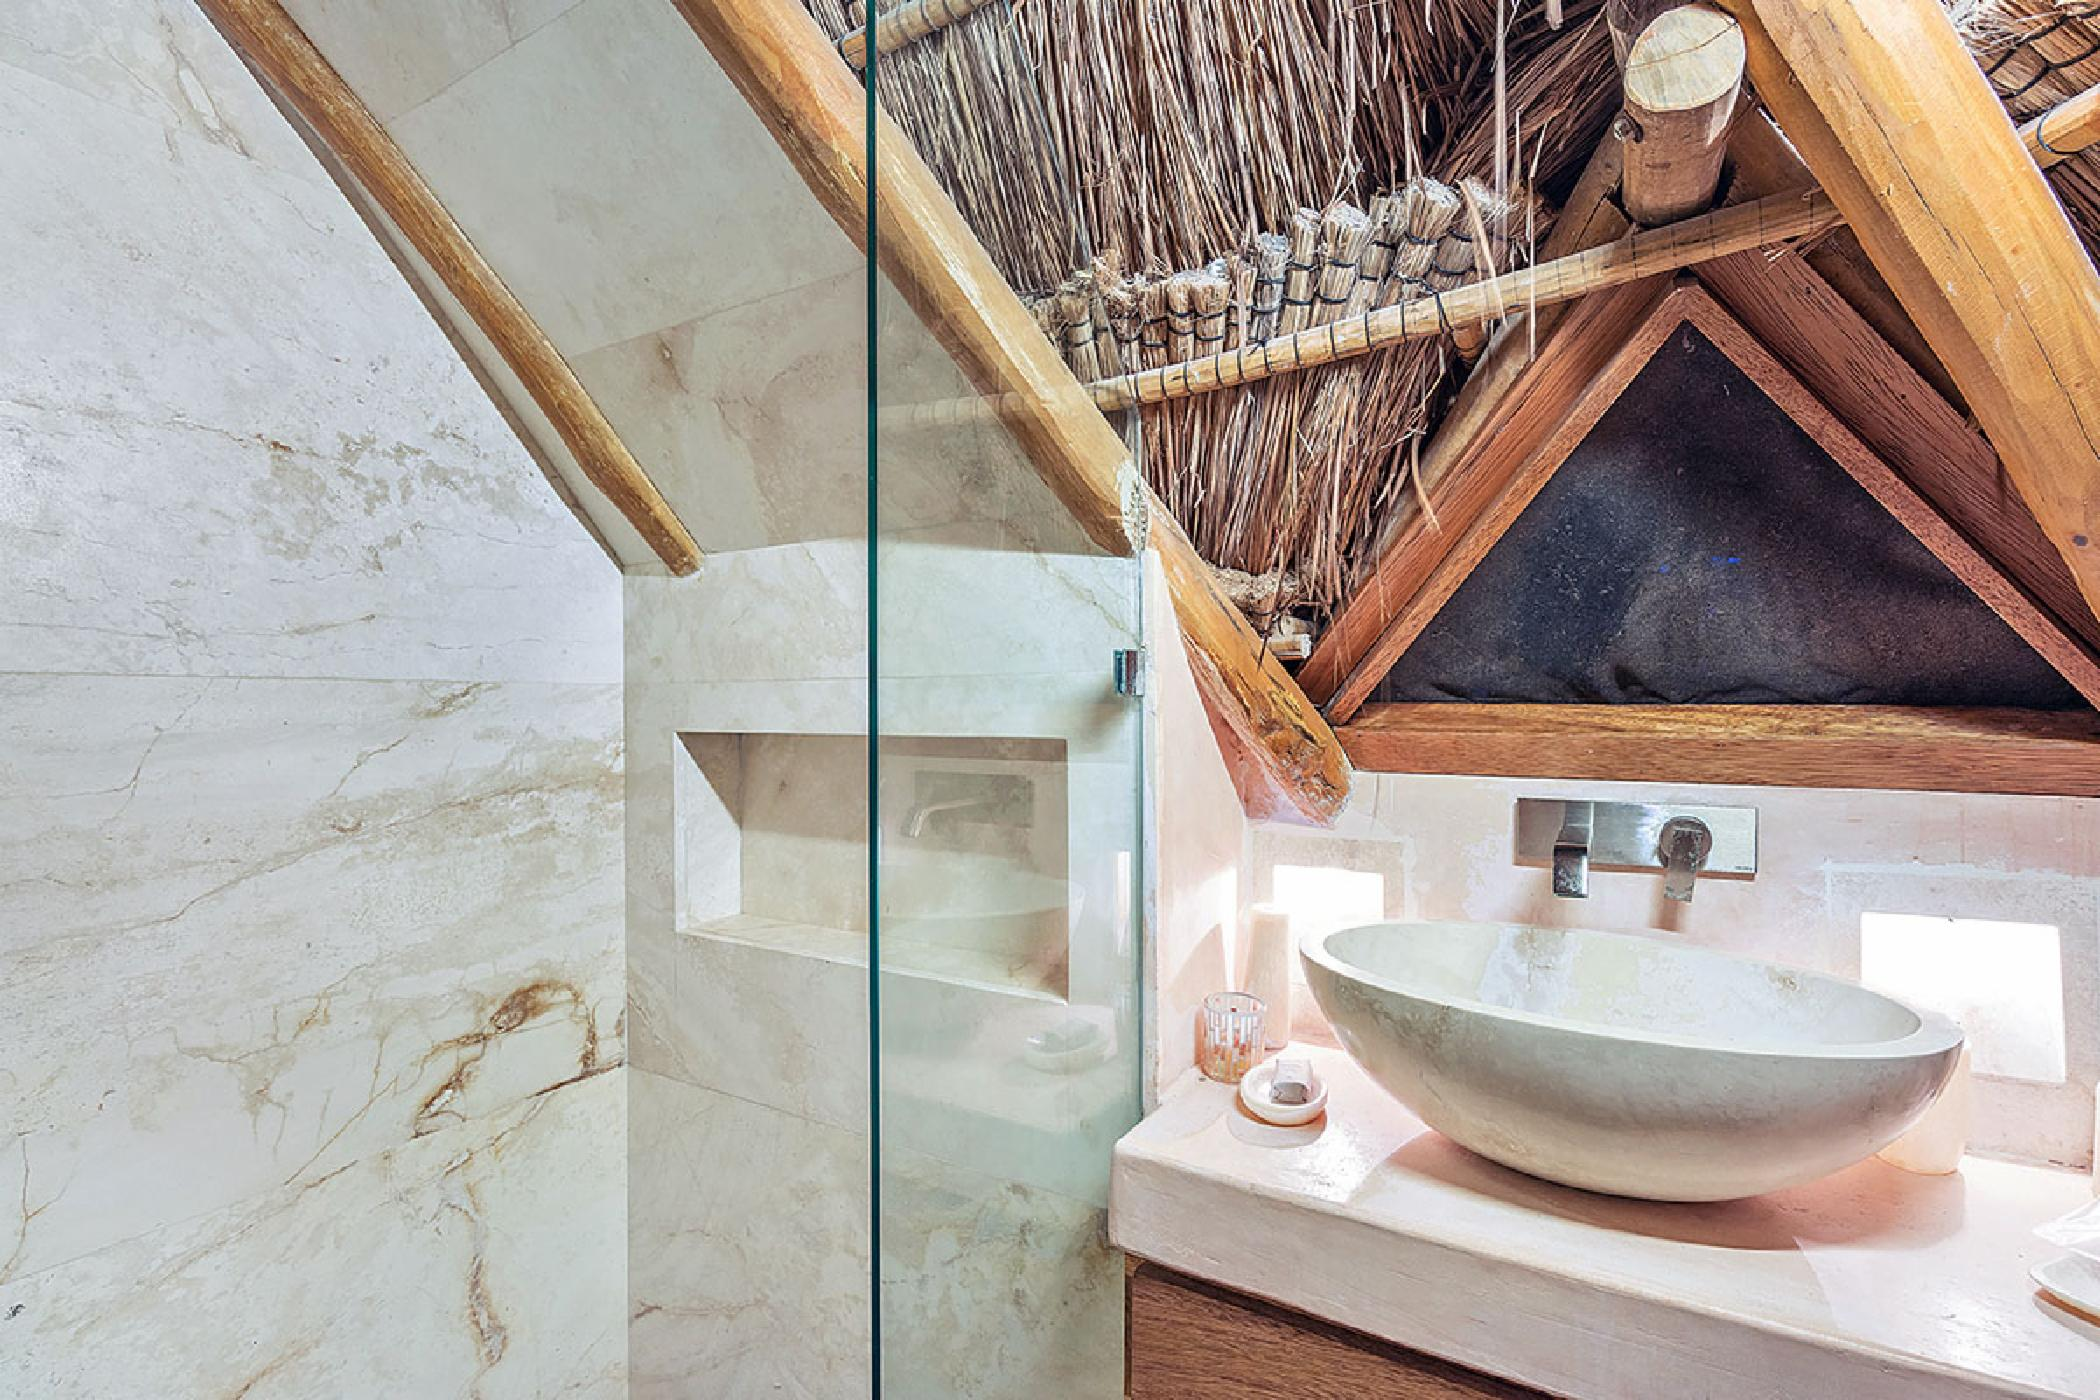 Maya_Luxe_Riviera_Maya_Luxury_Villas_Experiences_Sian_Kaan_Tulum_4_Bedrooms_Casa_Cantarena_26.jpg